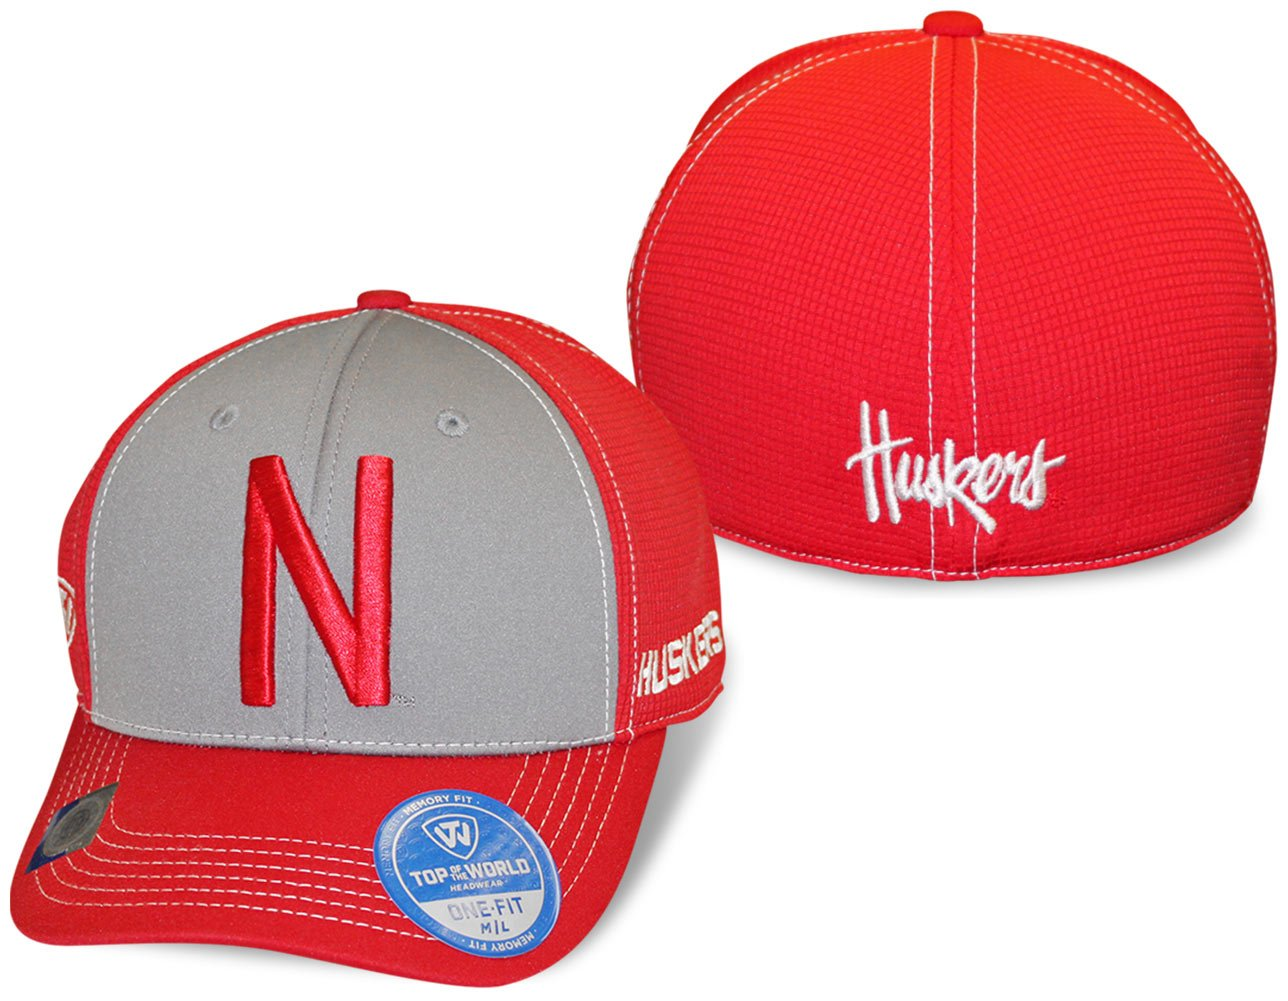 new arrival 42a67 be77e Amazon.com   Nebraska Cornhuskers Two-Tone Dynamic Memory Fit Flex Fit Hat    Cap Sizes 7 - 7 1 2   Sports   Outdoors